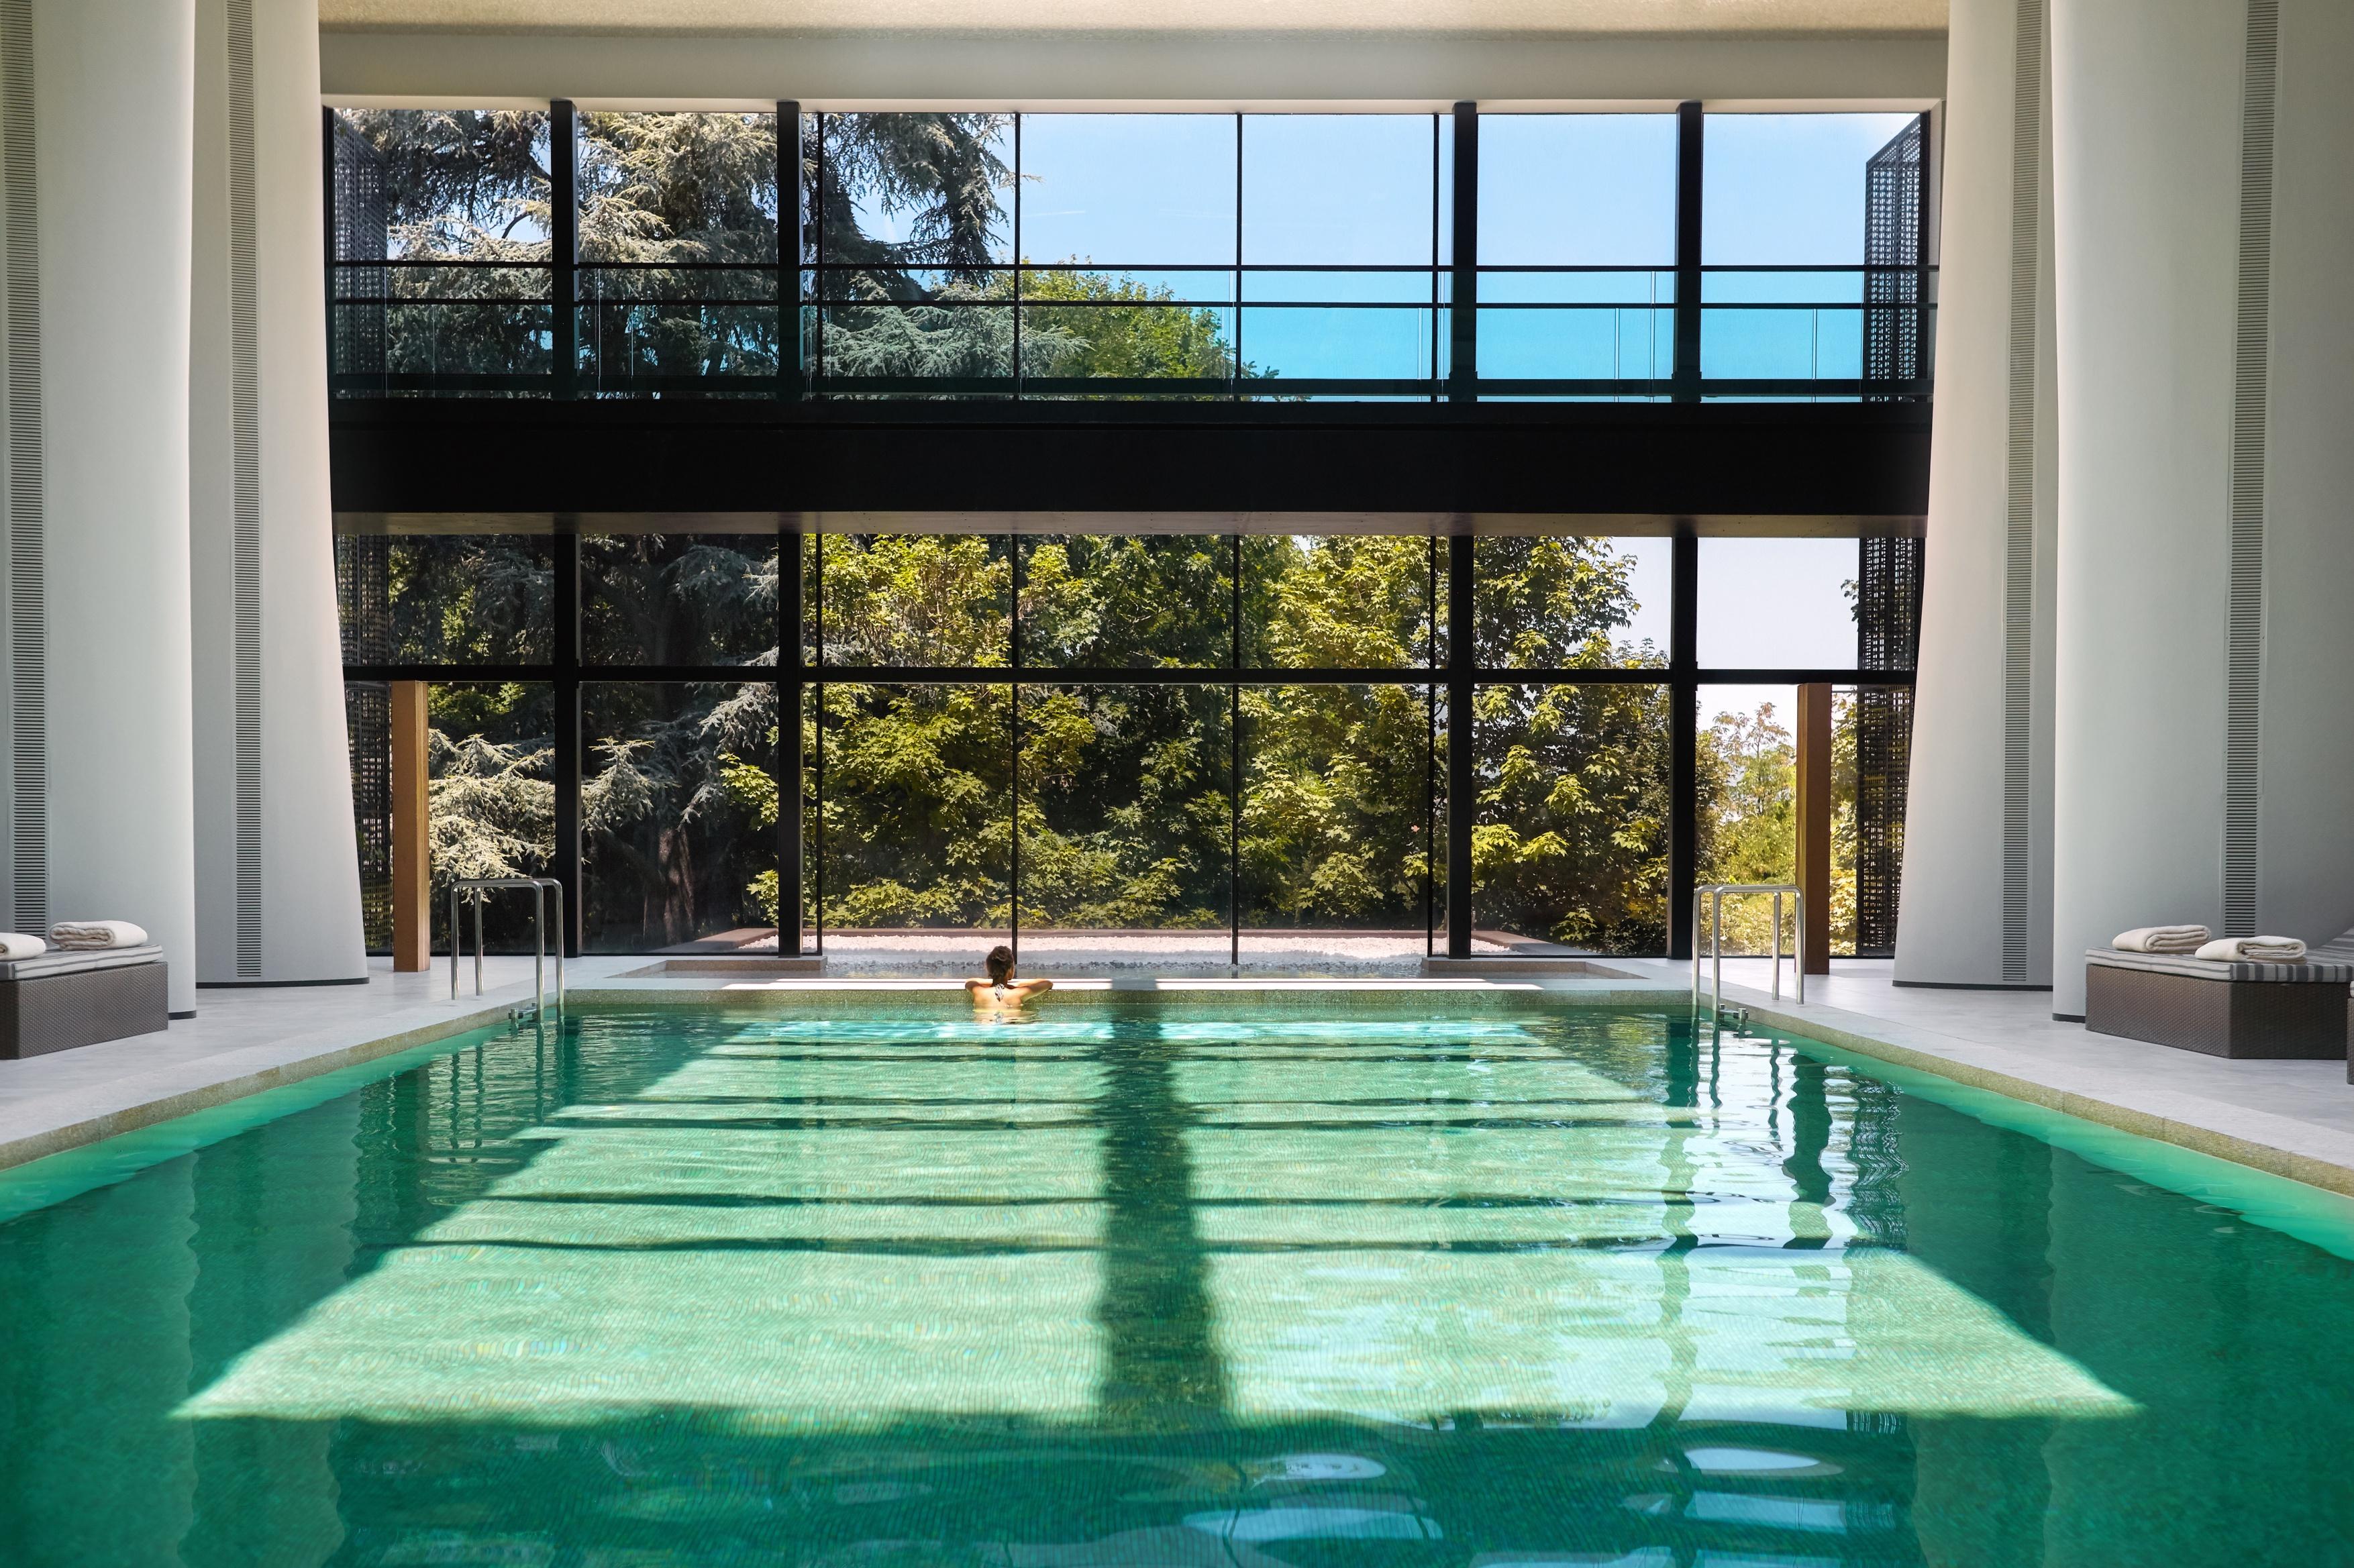 Spa_indoor_pool_model_6246-A4